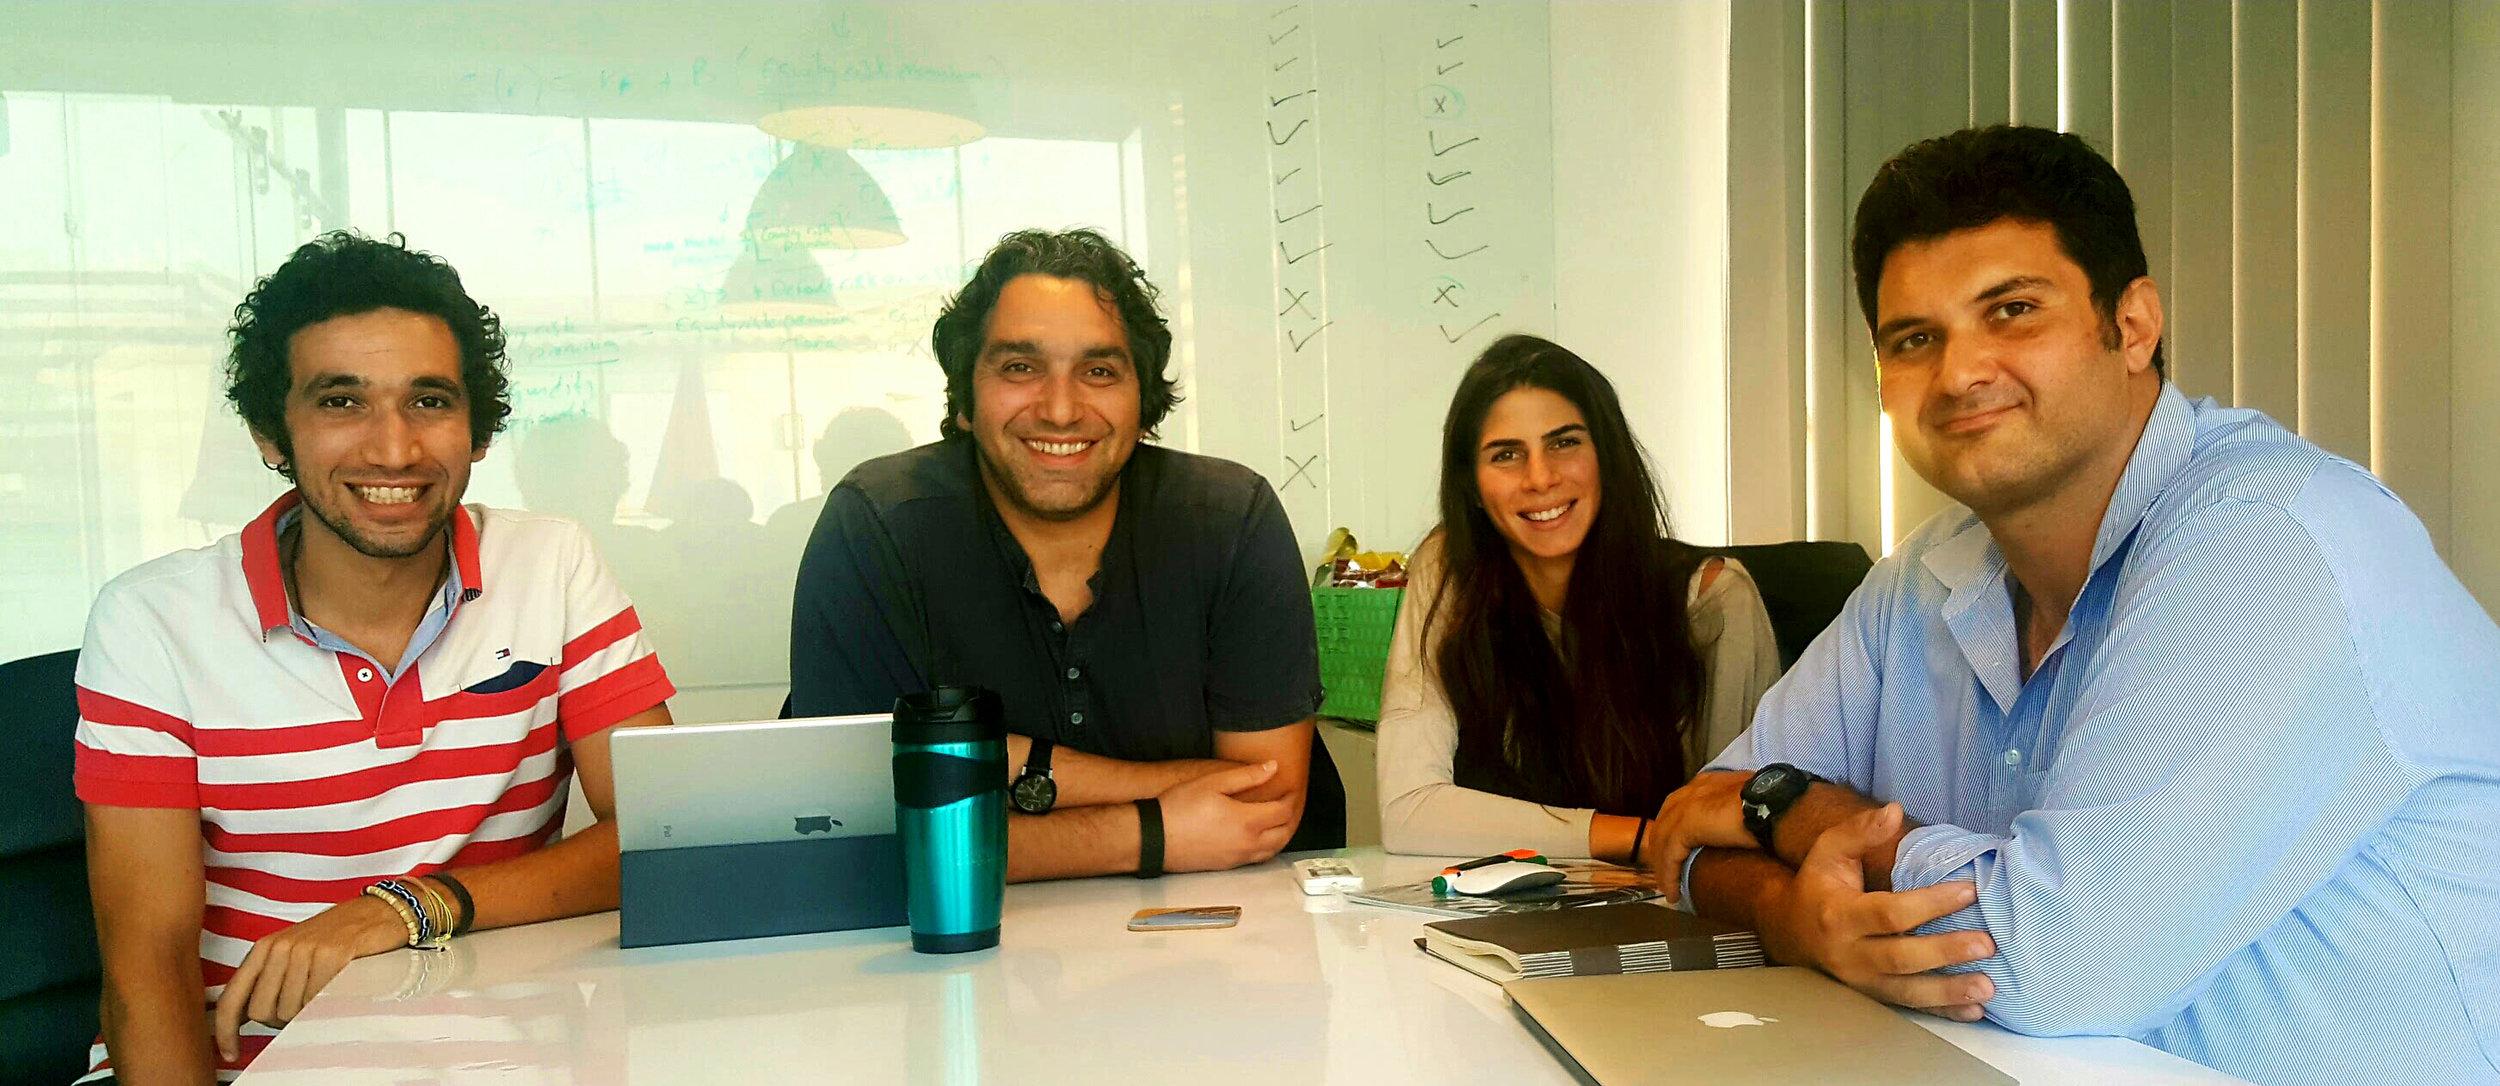 The Tayebat Workers Village Design Team: Mahmoud Radwan, Karim El Kafrawi, Nadine Abulfadl, Mostafa Ascar. Courtesy KarmSolar.